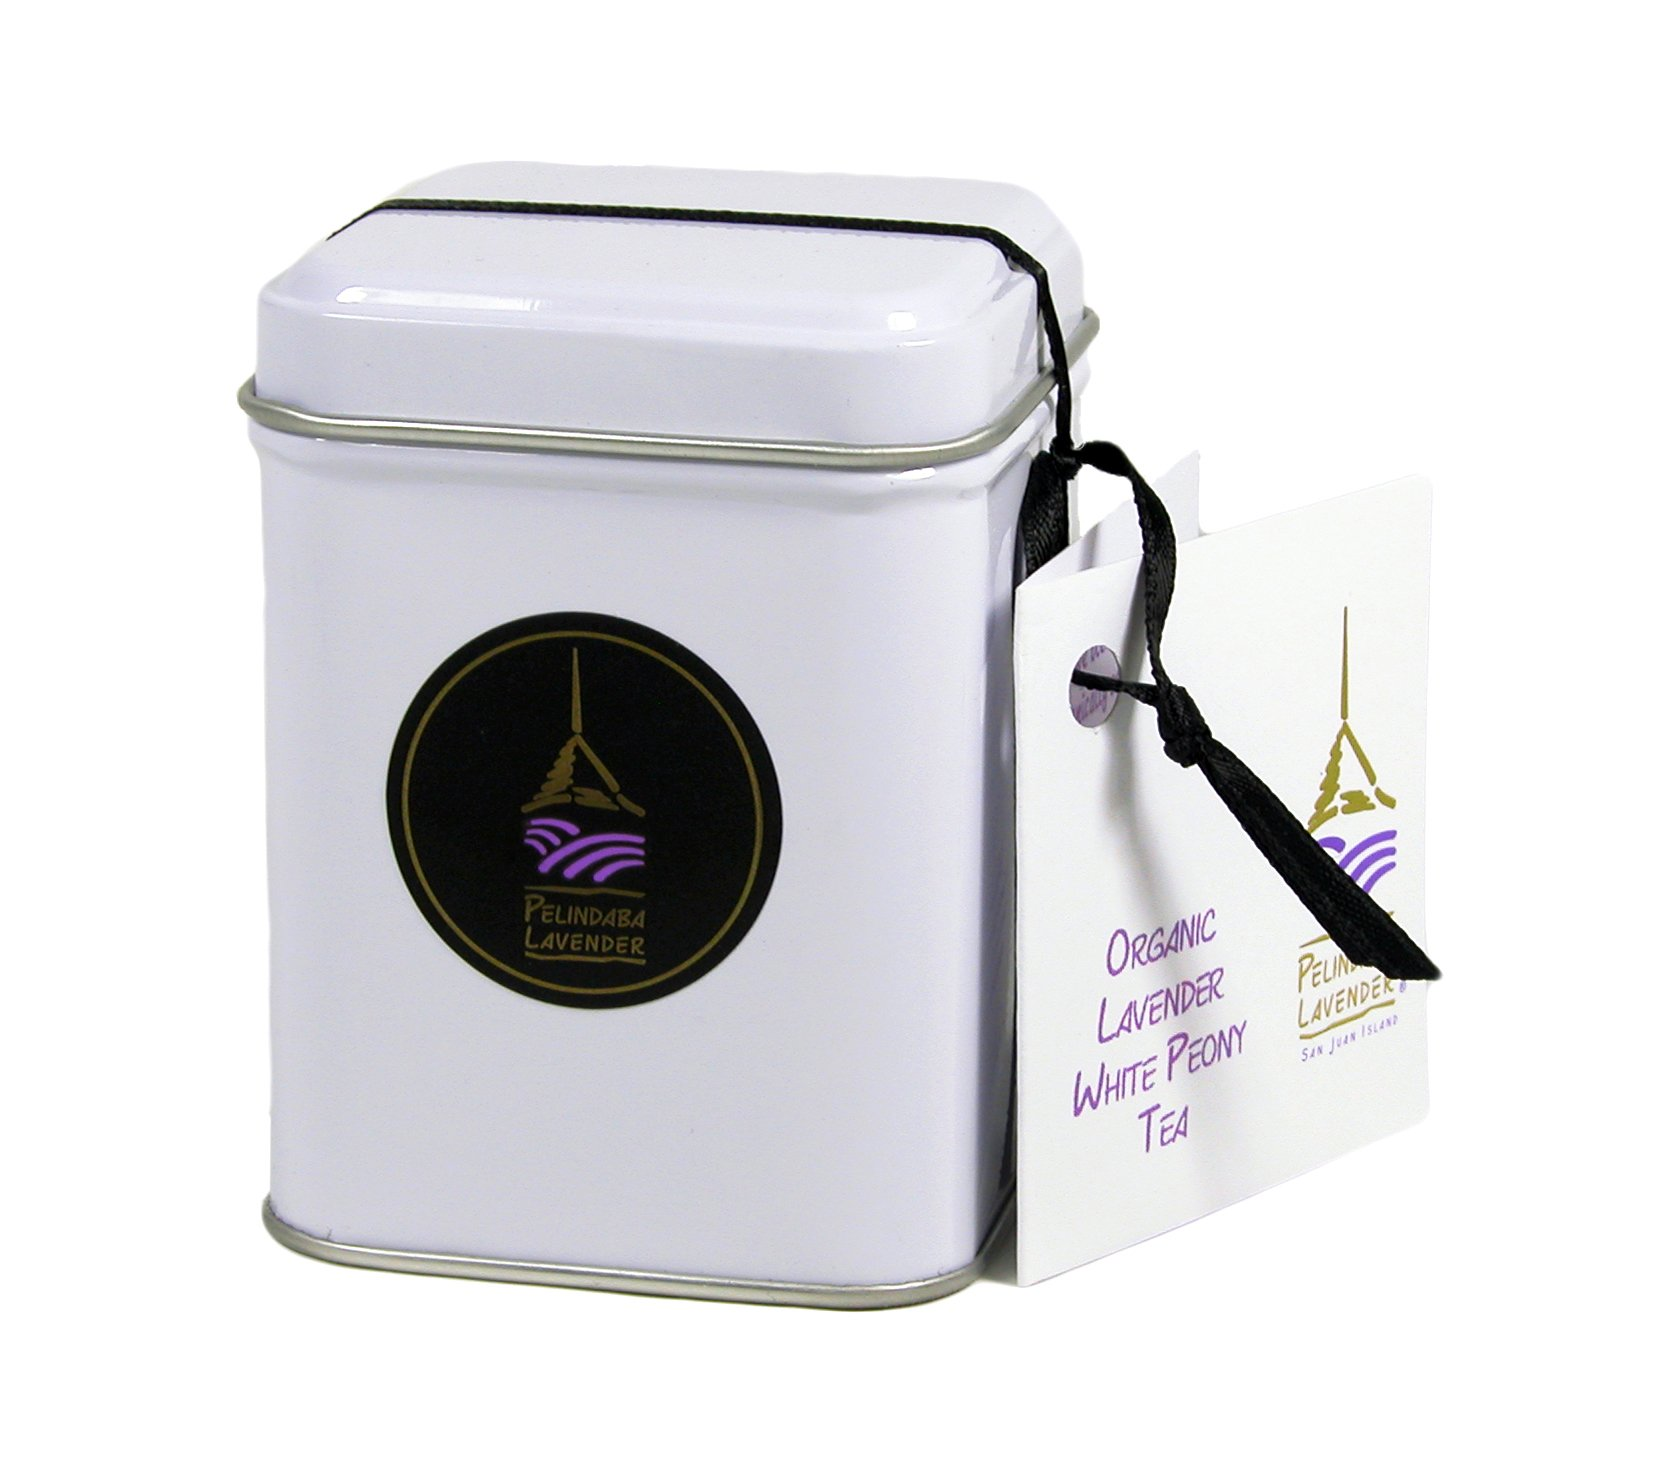 Pelindaba Lavender Organic Lavender White Tea - 8oz by vol by Pelindaba Lavender